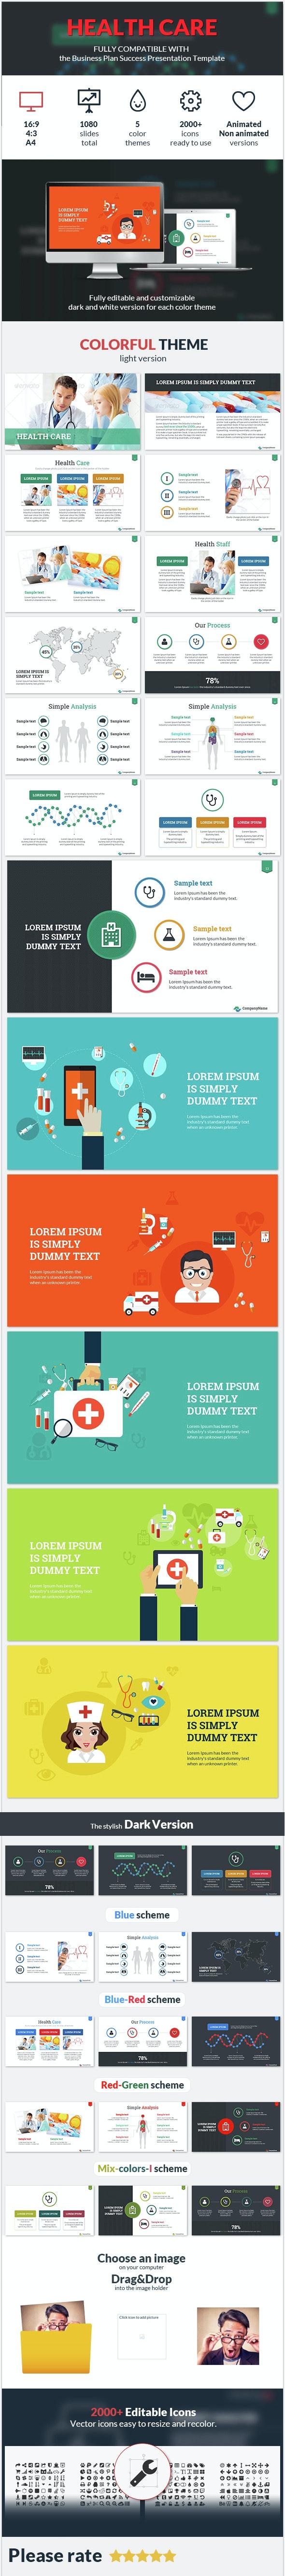 Health Care Success Presentation Template - Business PowerPoint Templates